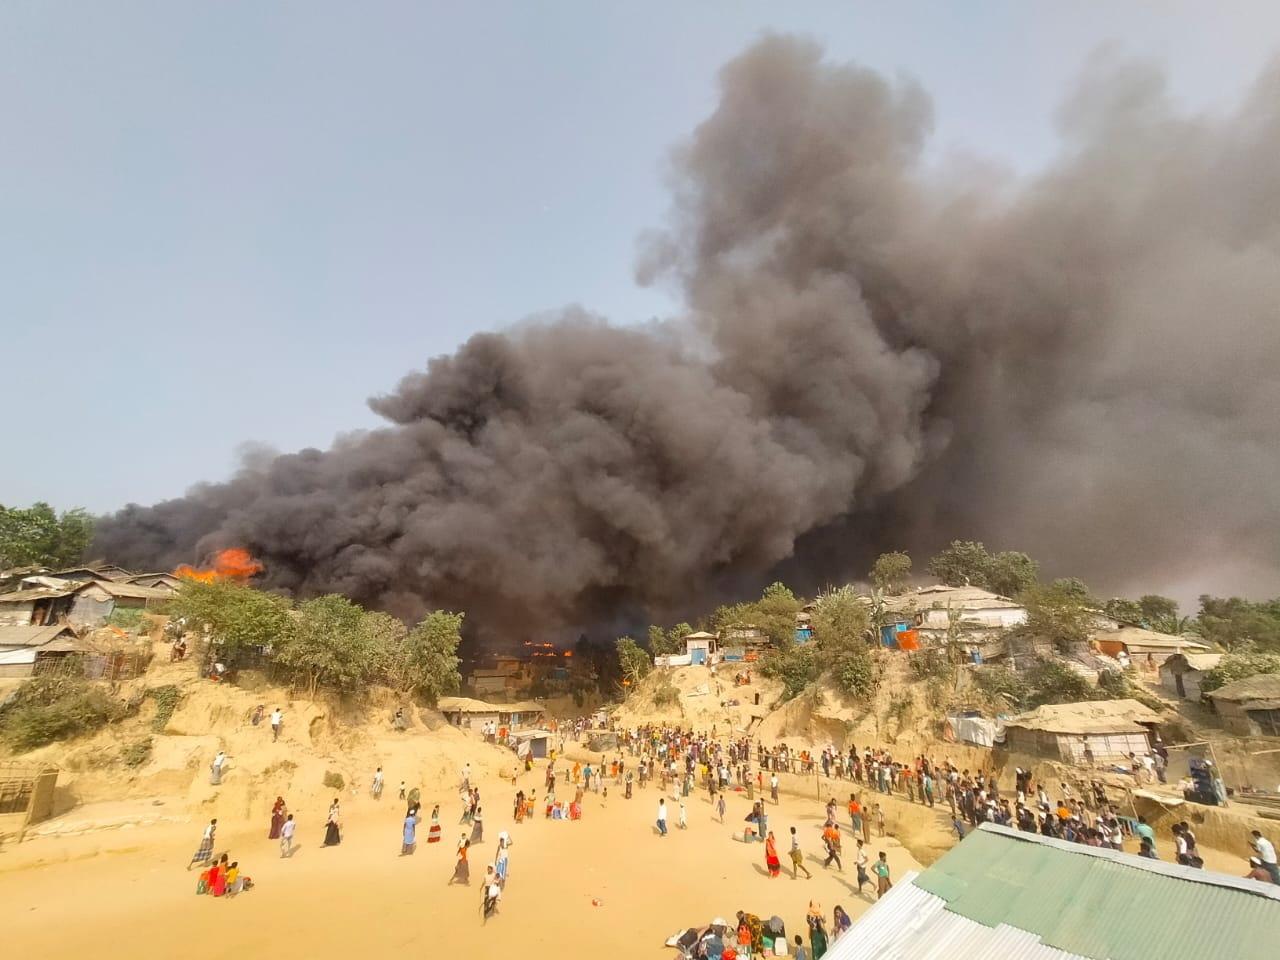 حريق مخيم للروهينغا في بنغلاديش